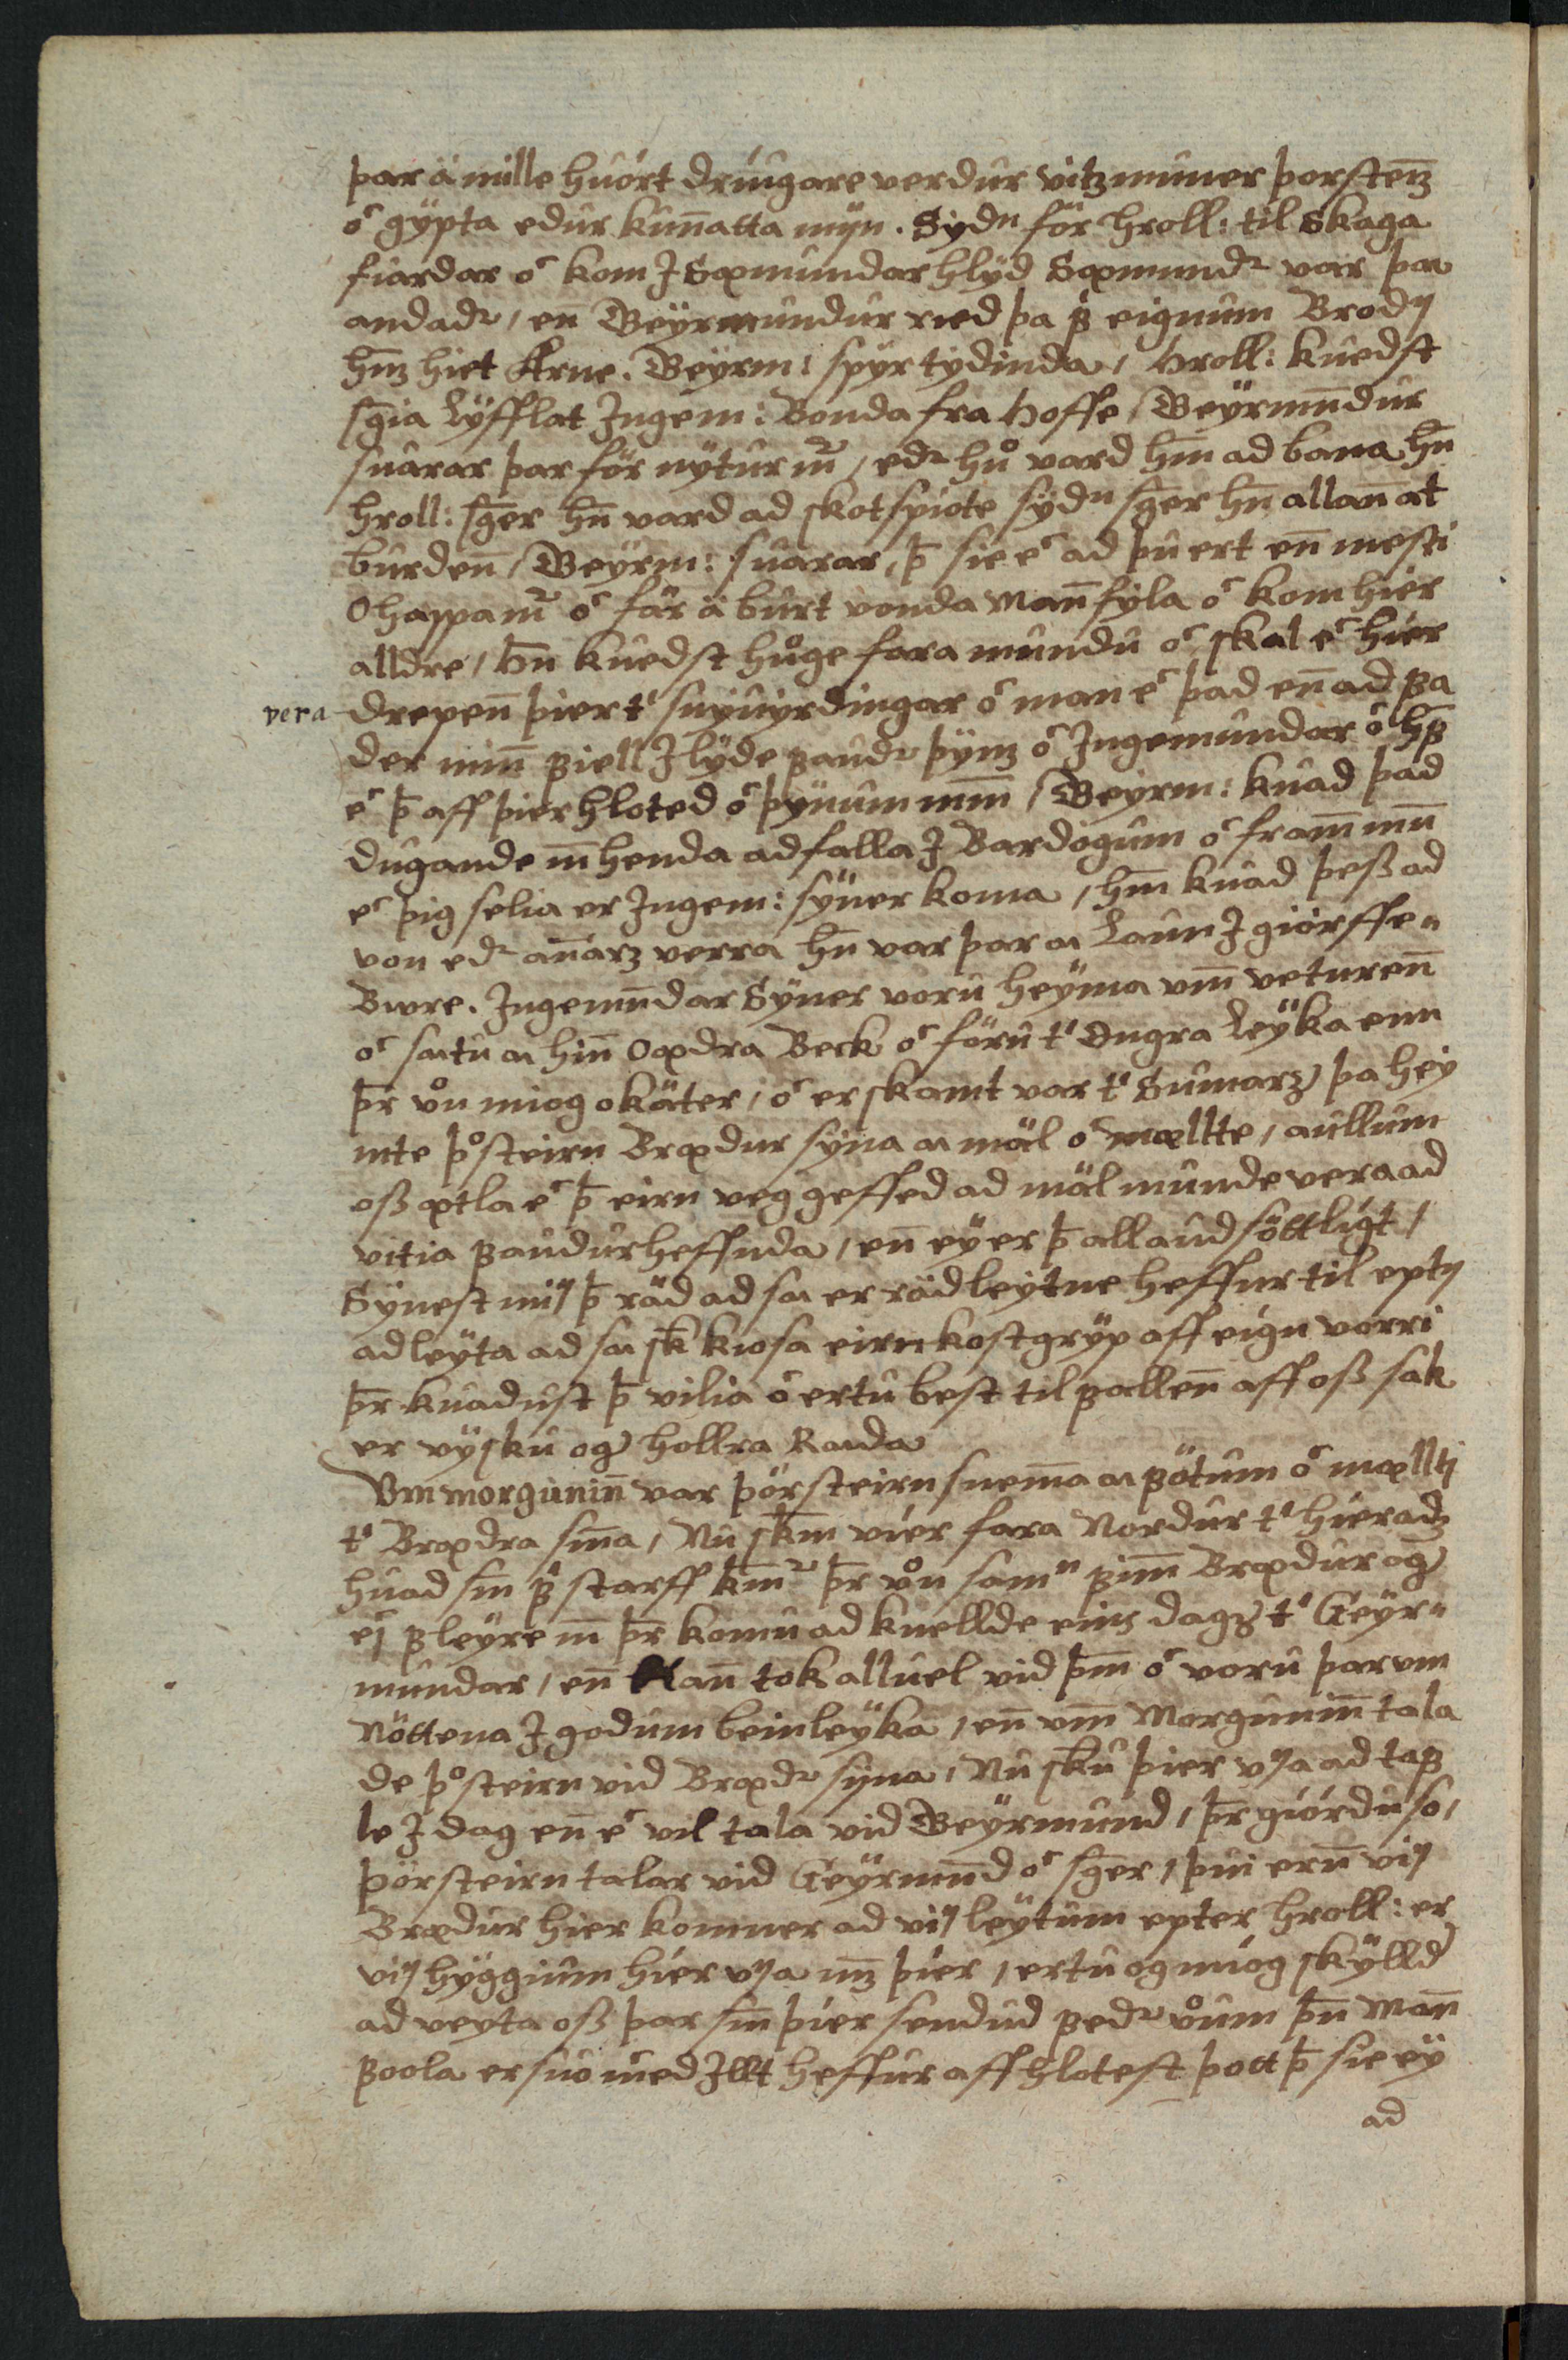 AM 138 fol - 19v